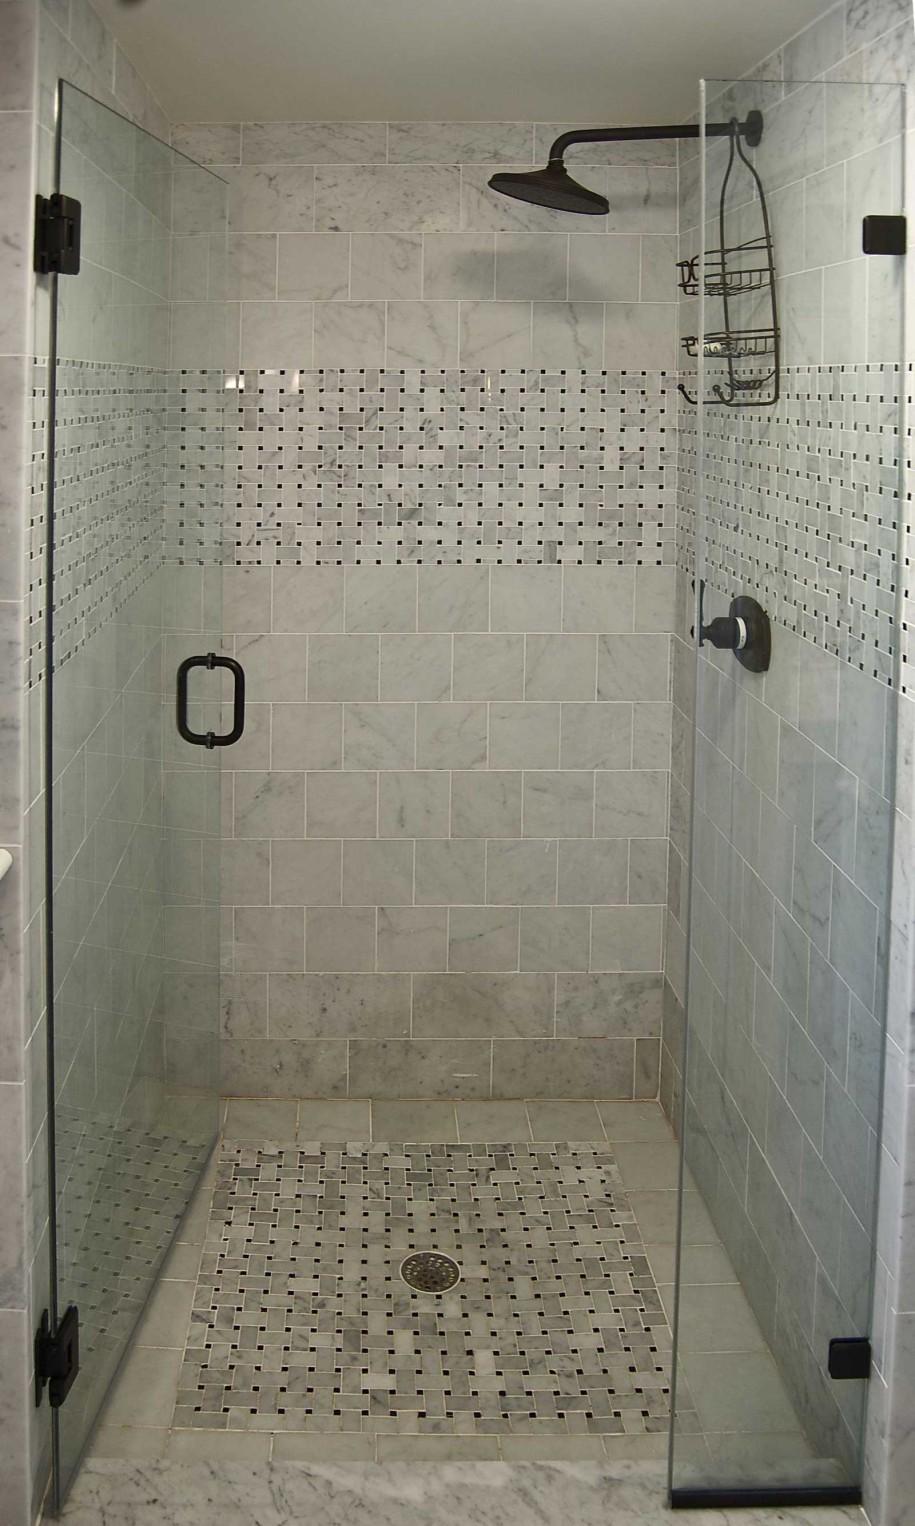 Best Kitchen Gallery: Shower Design Ideas Small Bathroom Large And Beautiful Photos of Bathroom Tile Shower Designs  on rachelxblog.com